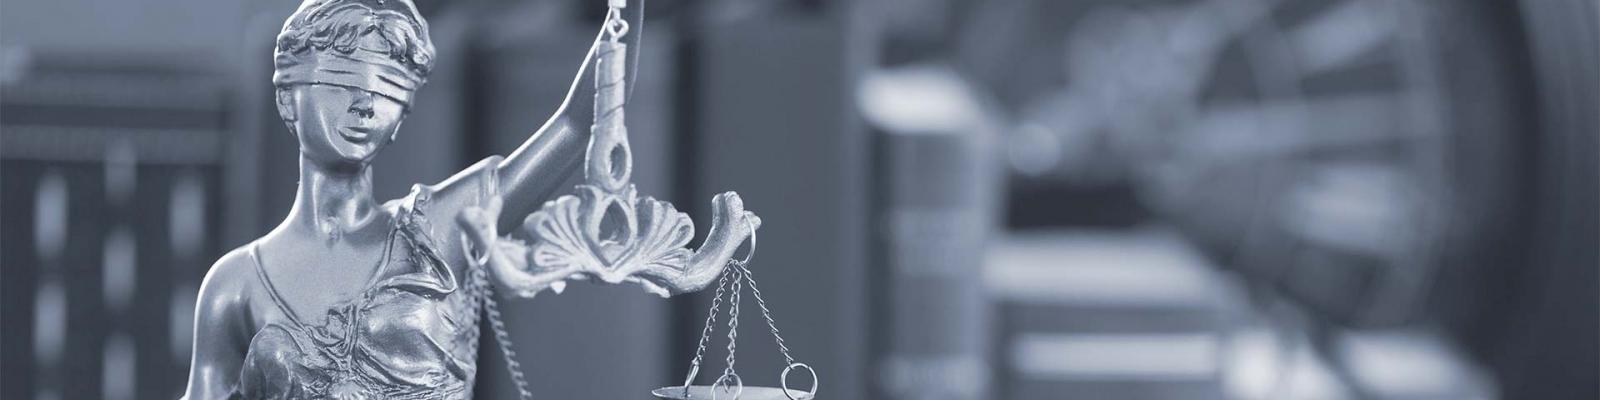 bg-civil-law